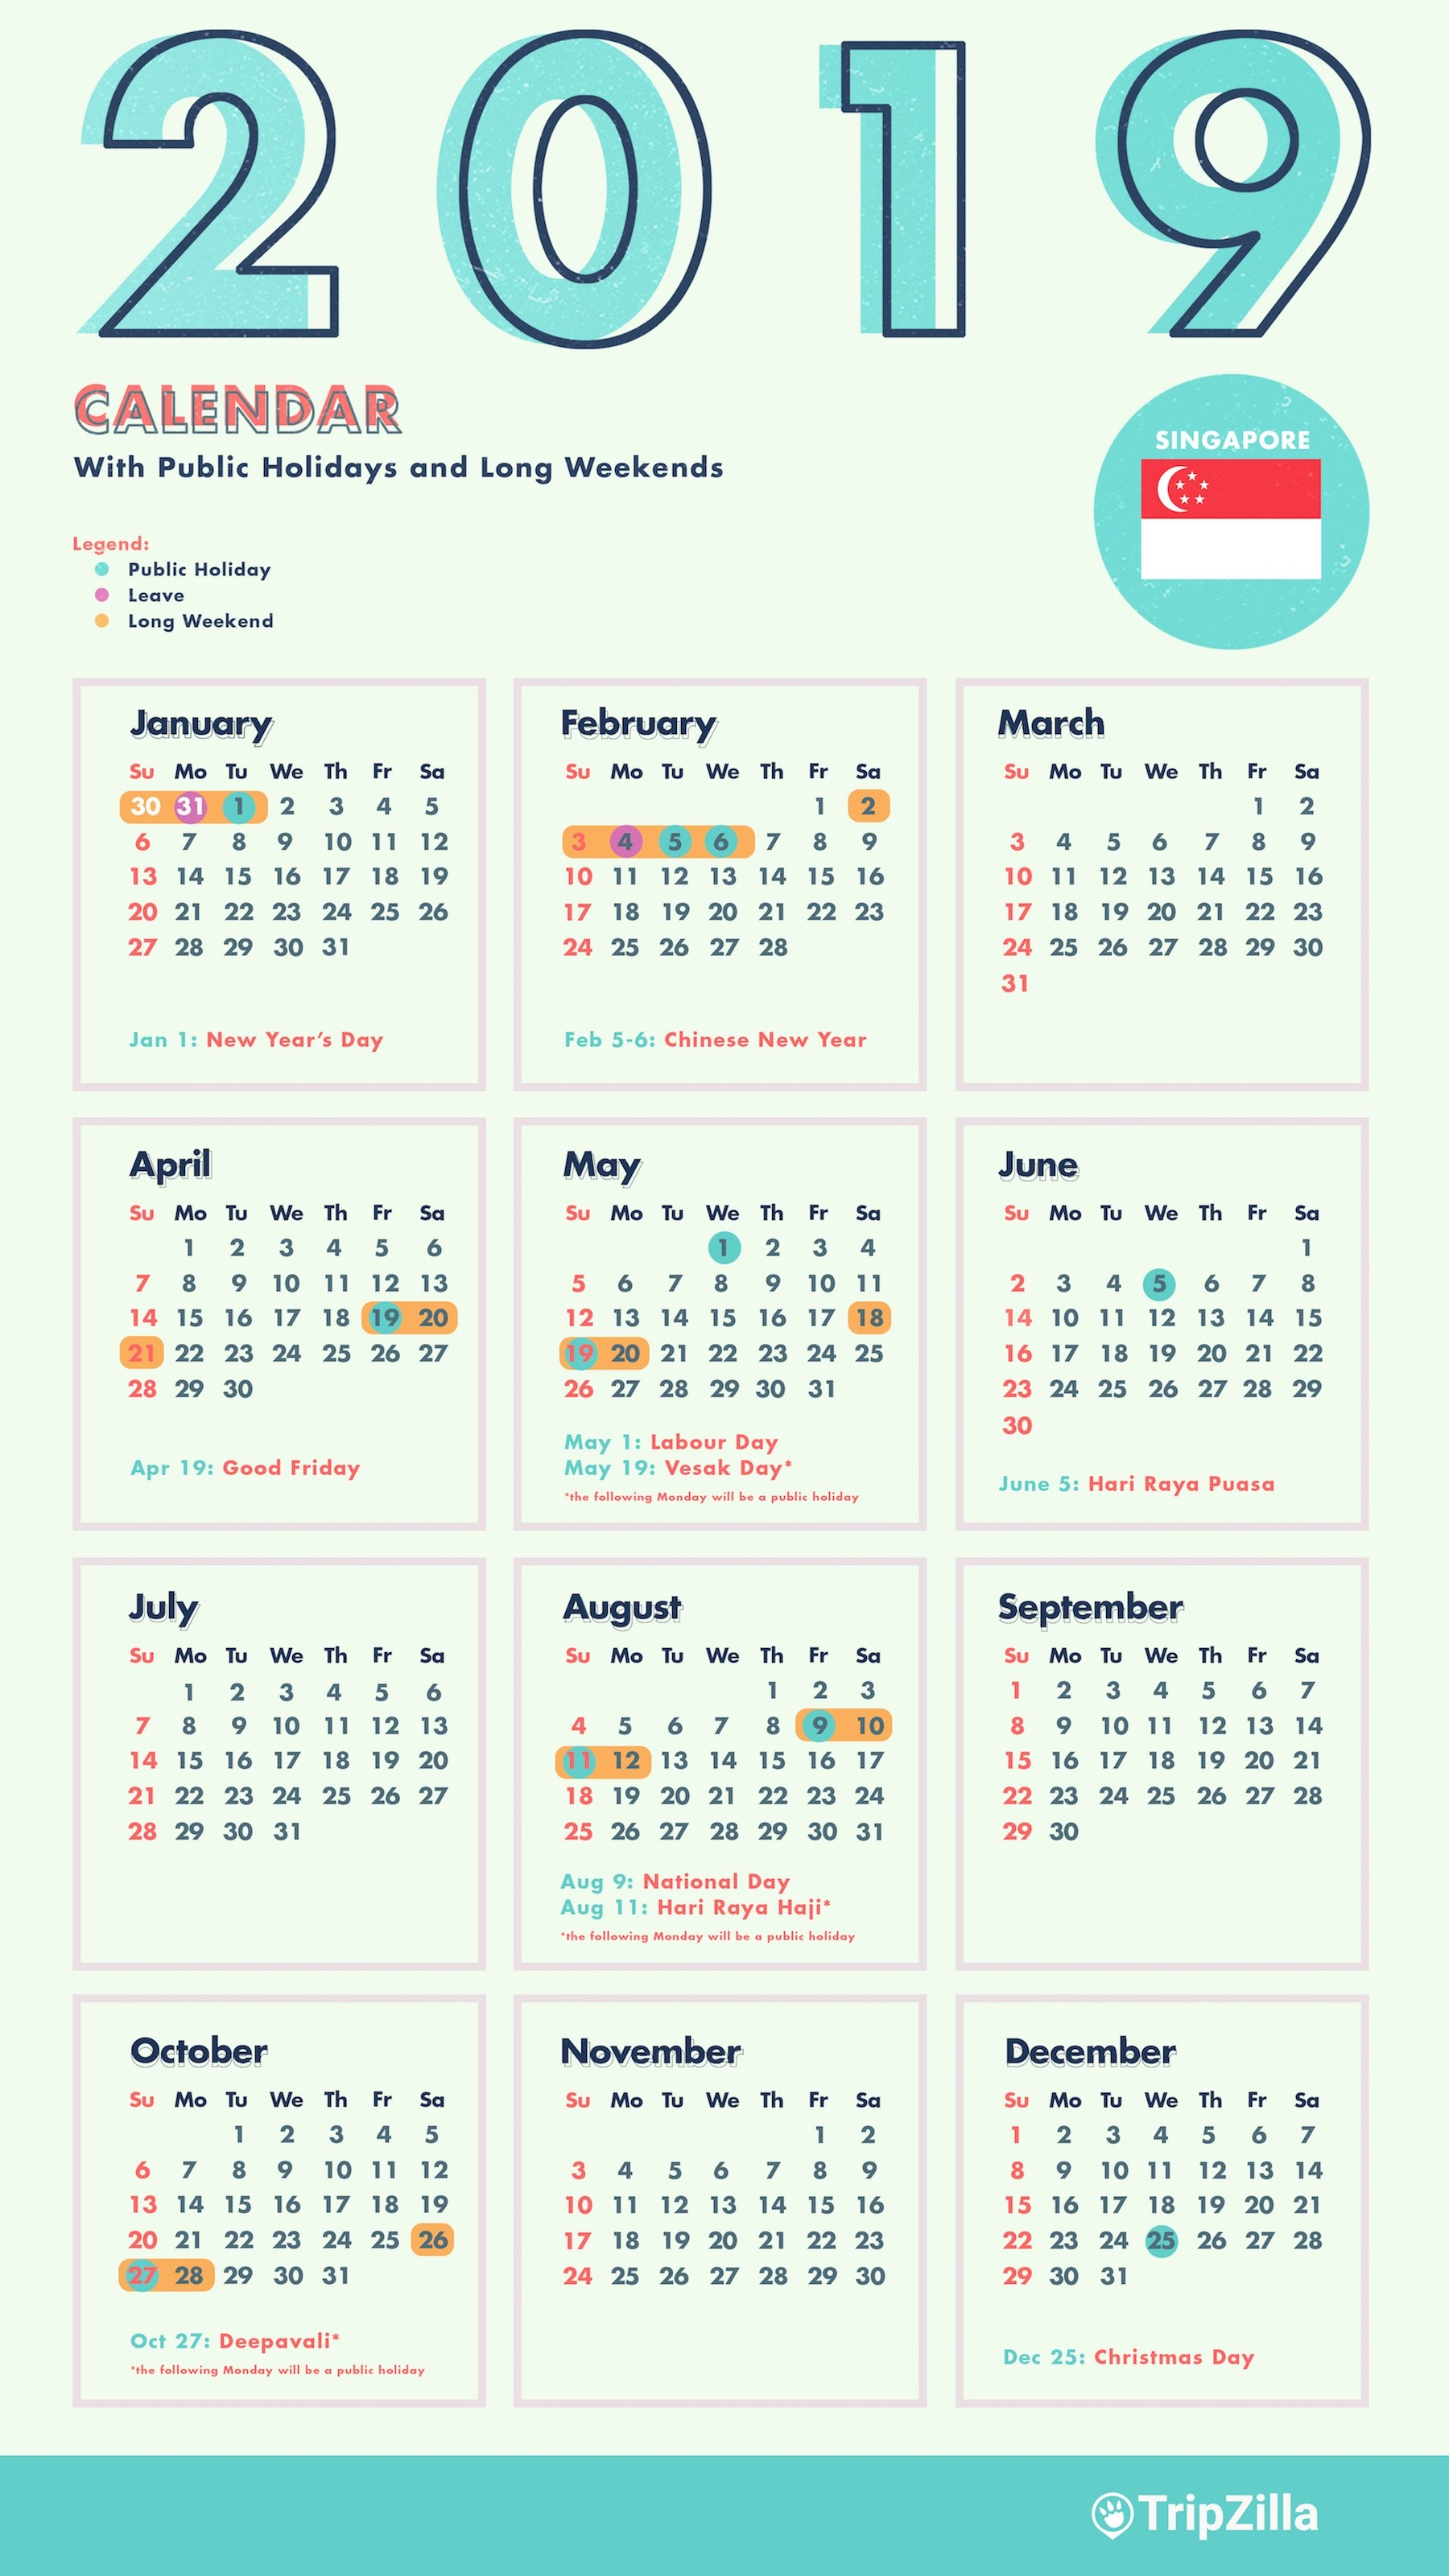 6 Long Weekends In Singapore In 2019 (Bonus Calendar & Cheatsheet) Calendar 2019 With Holidays